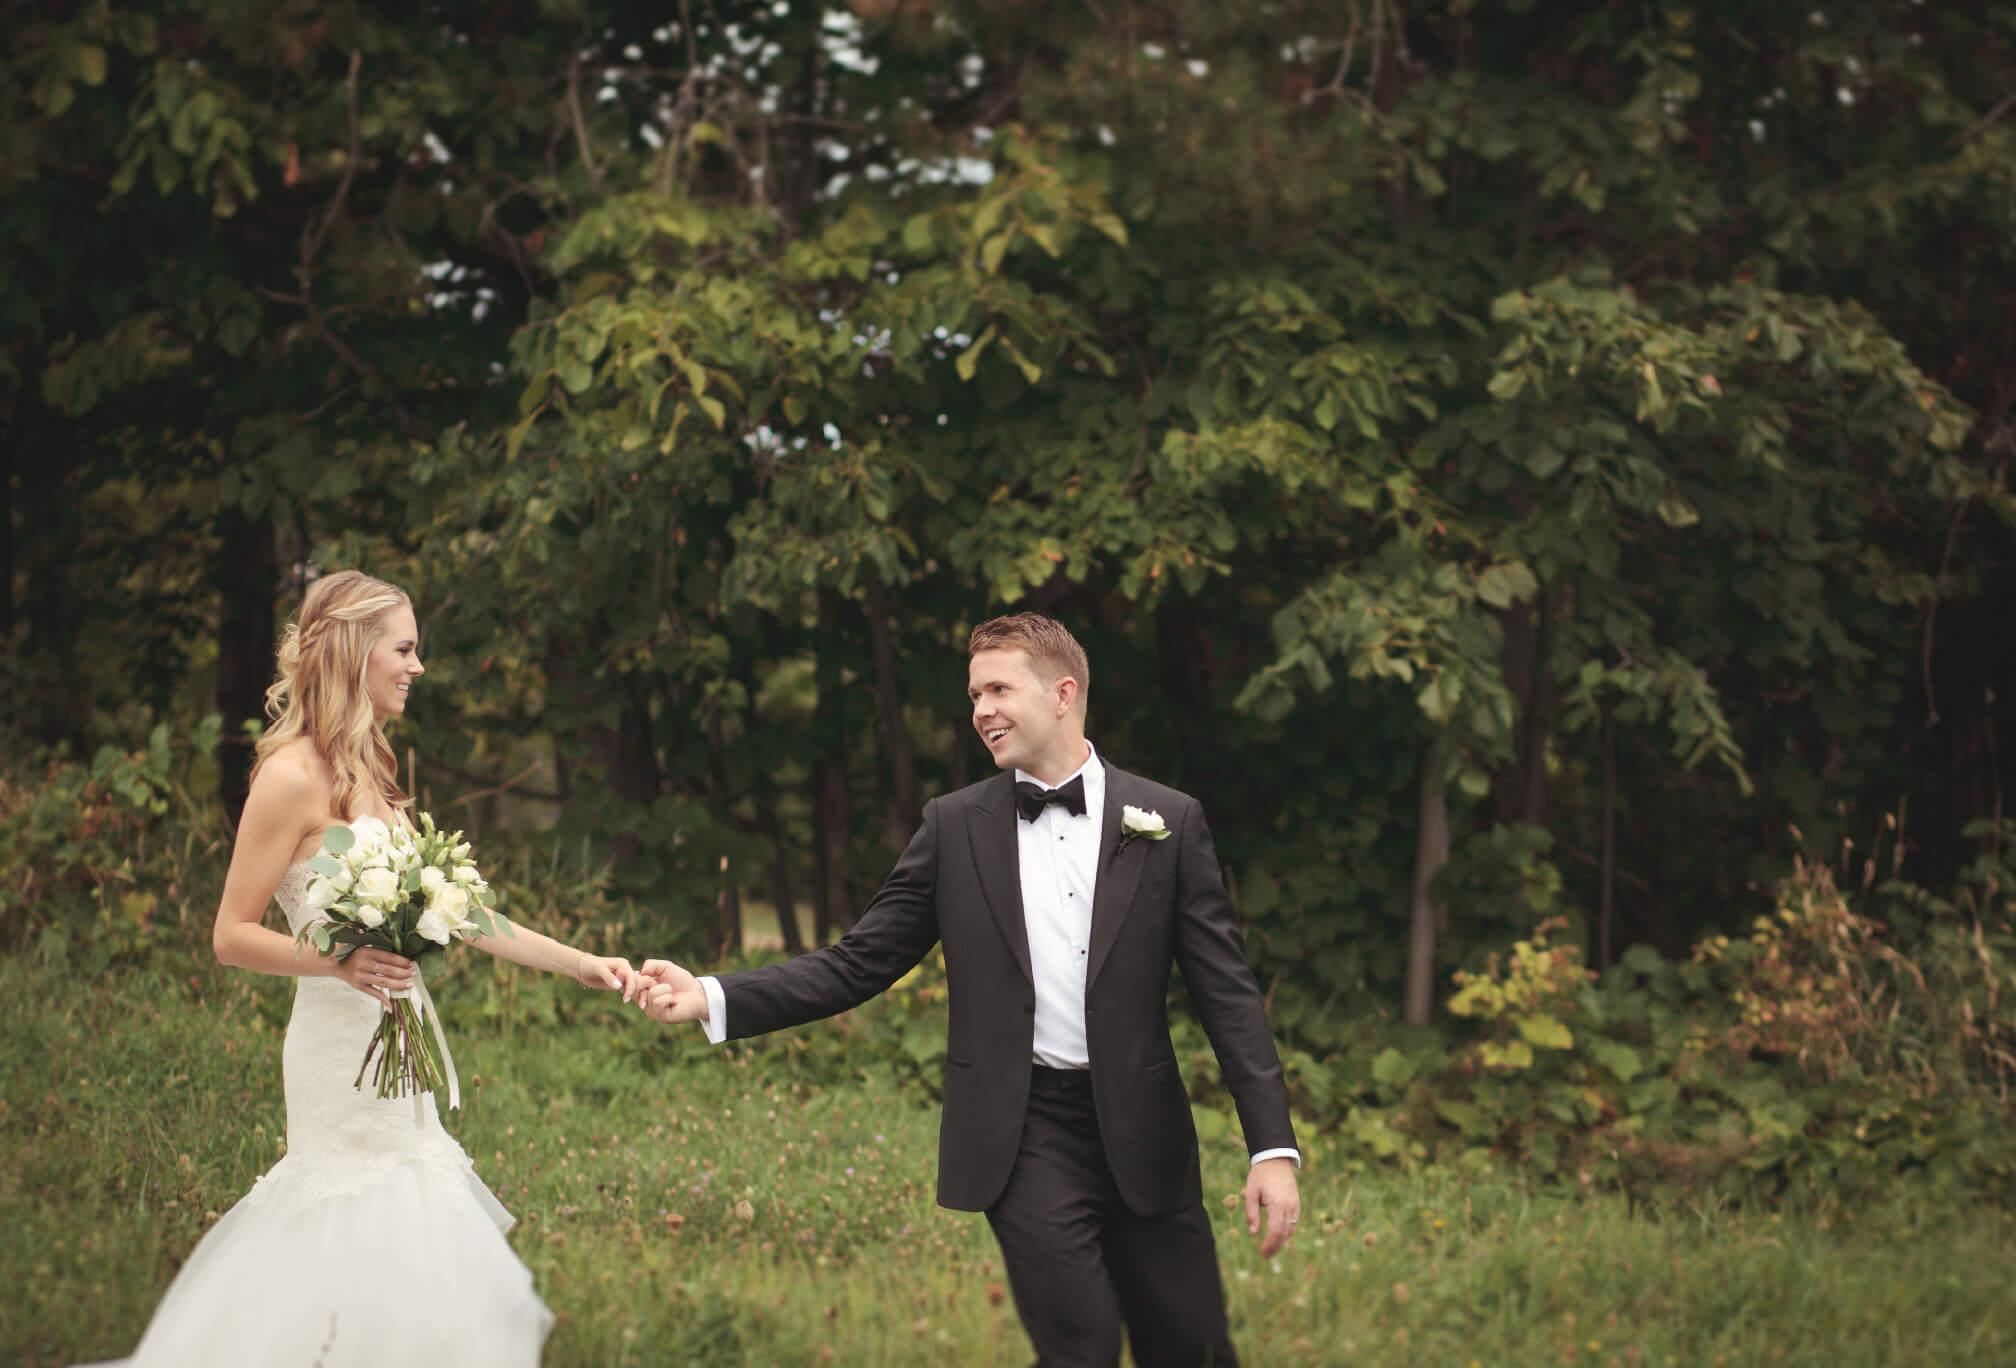 wedding photography at craigleith ski club